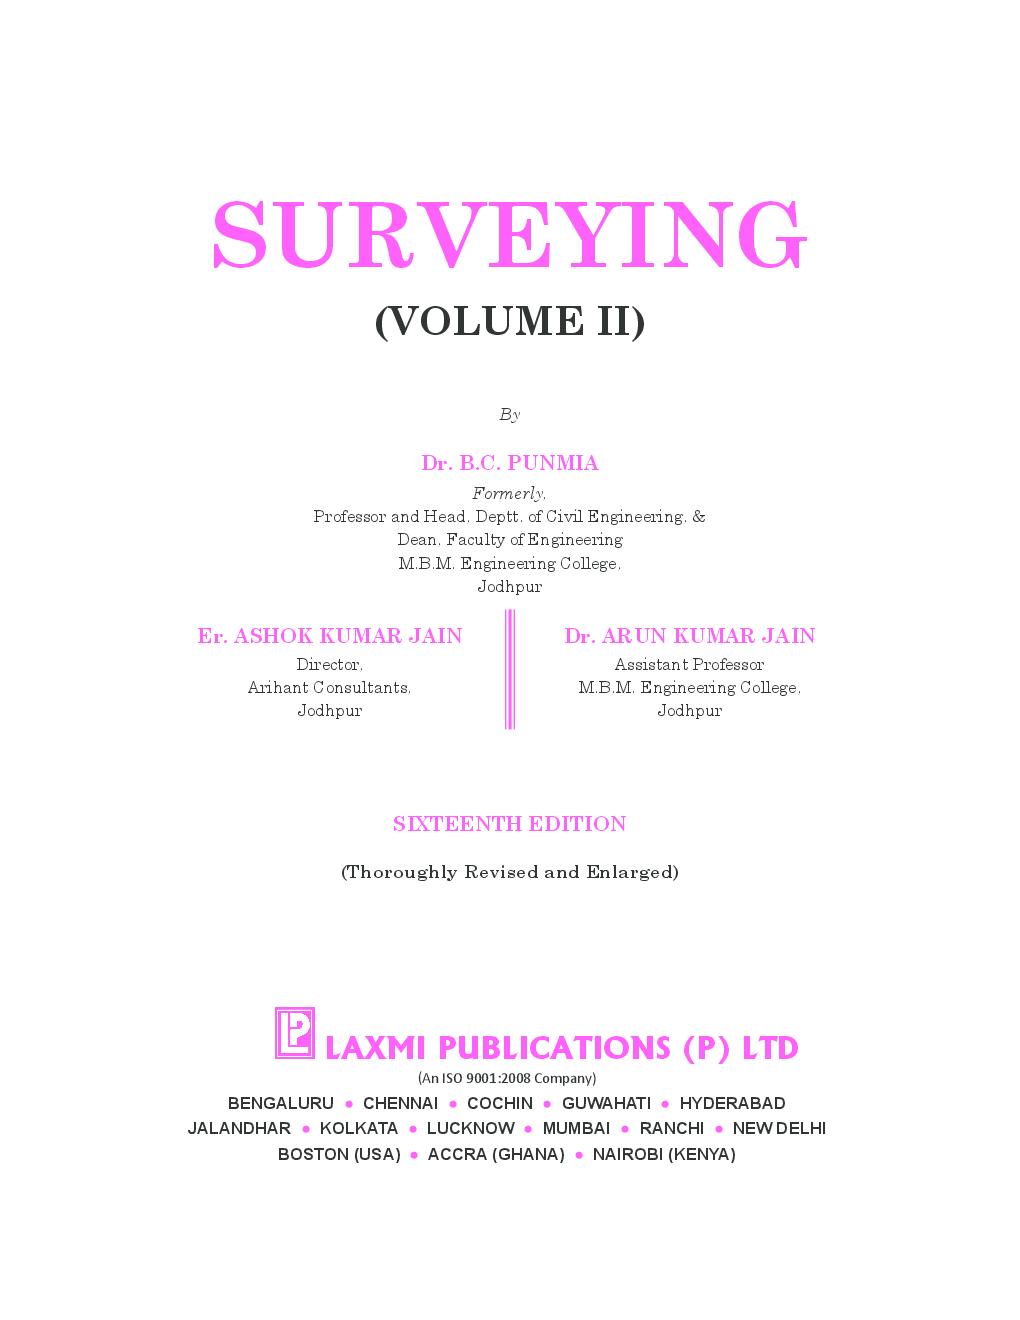 Surveying Vol.II  - Page 5